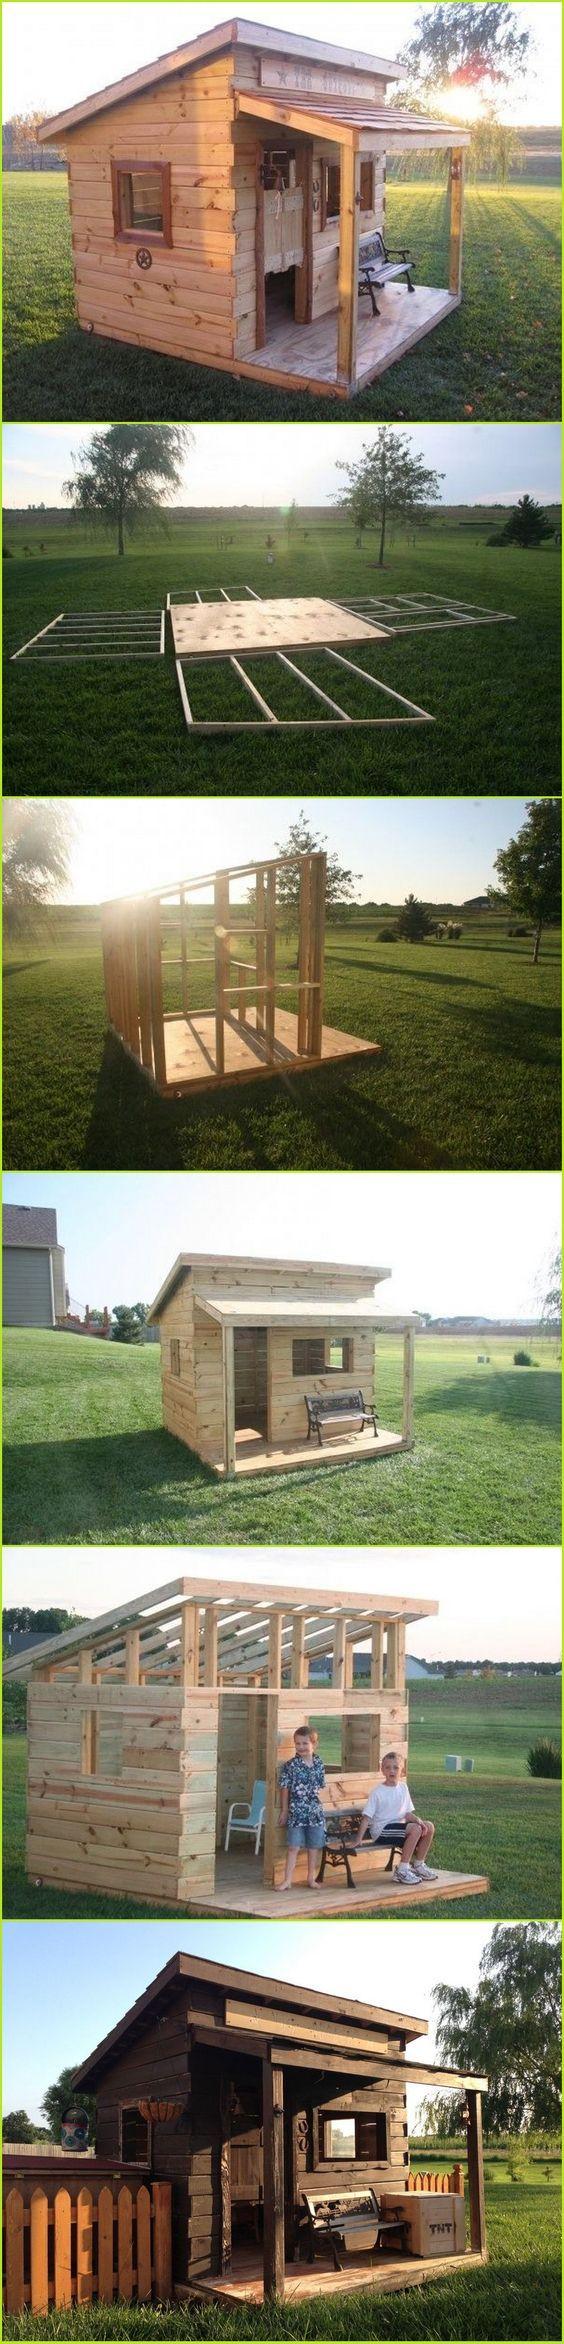 Petite cabane+petite terrasse couverte